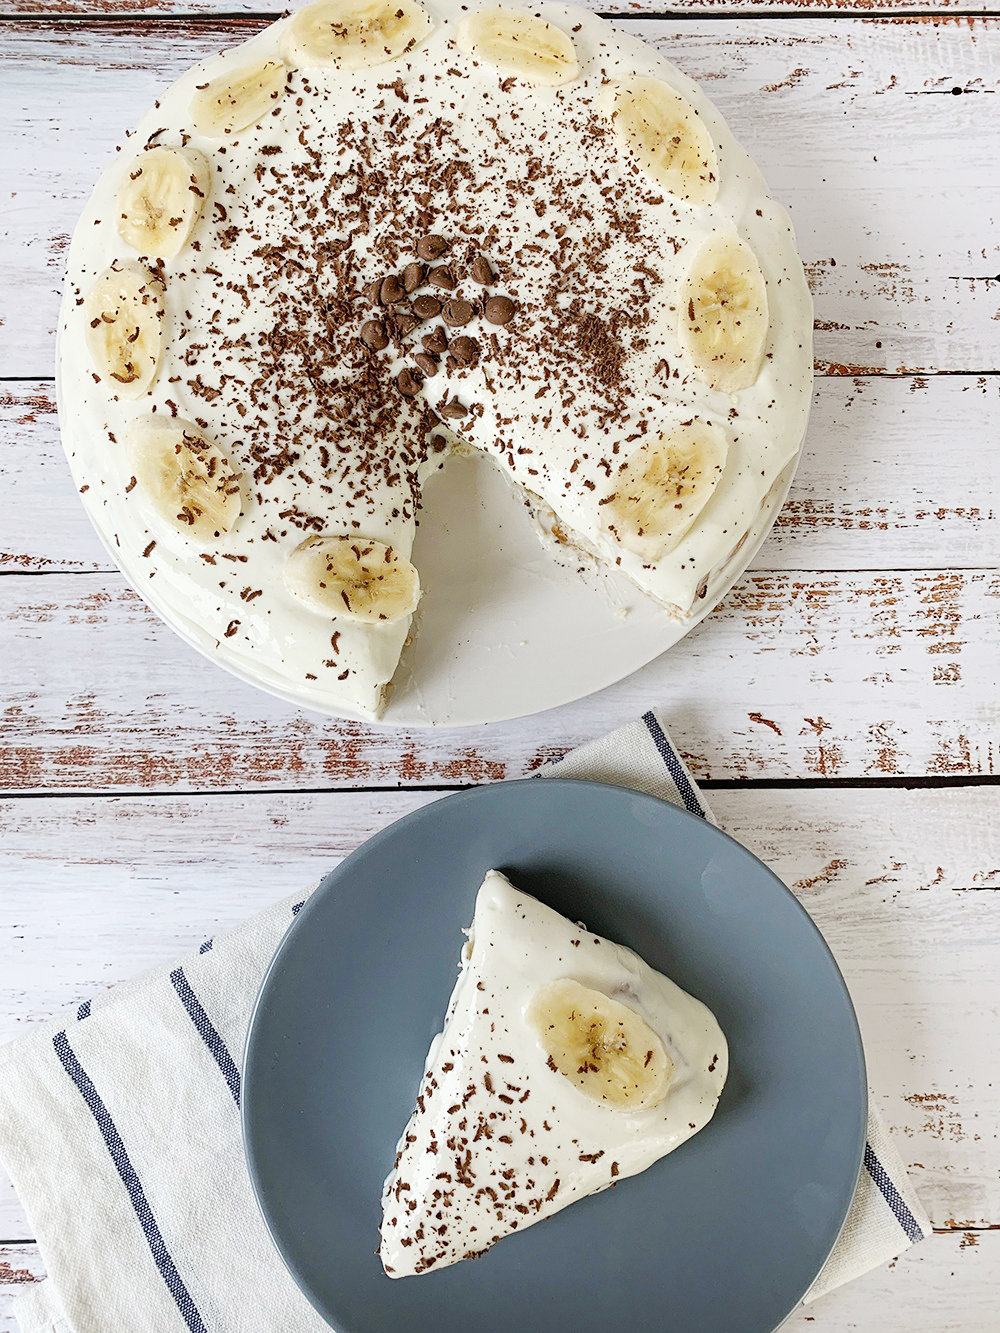 Keto Banana Cake With Cream Cheese Frosting